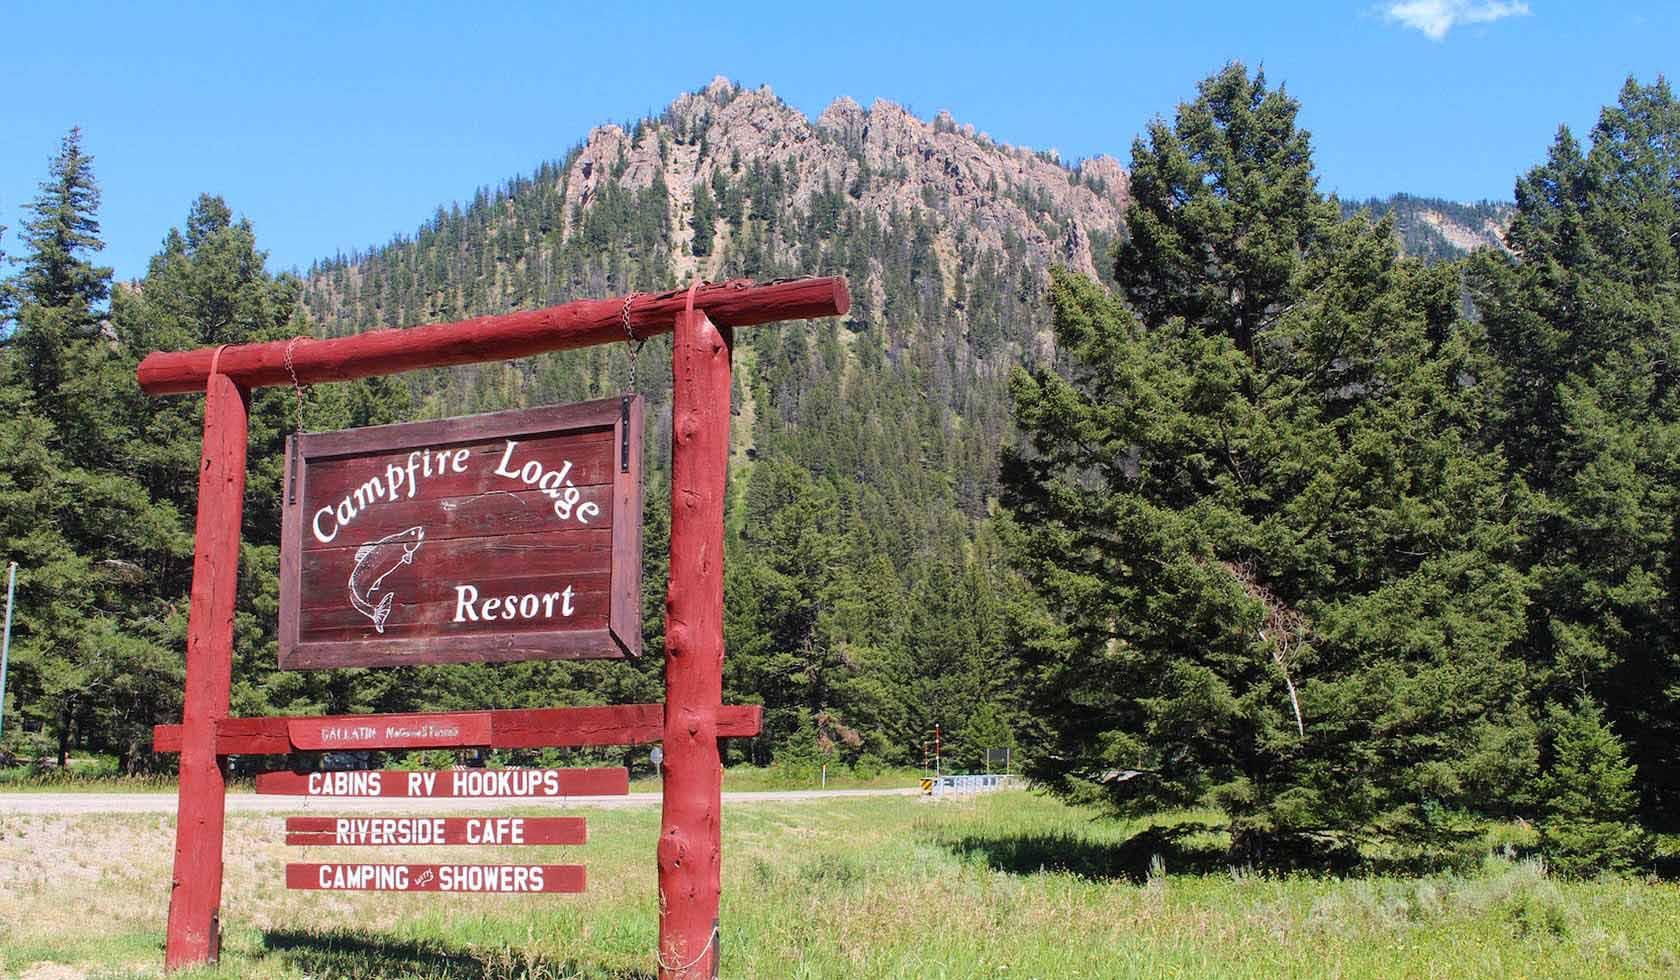 Campfire Lodge Resort, Inc. profile image